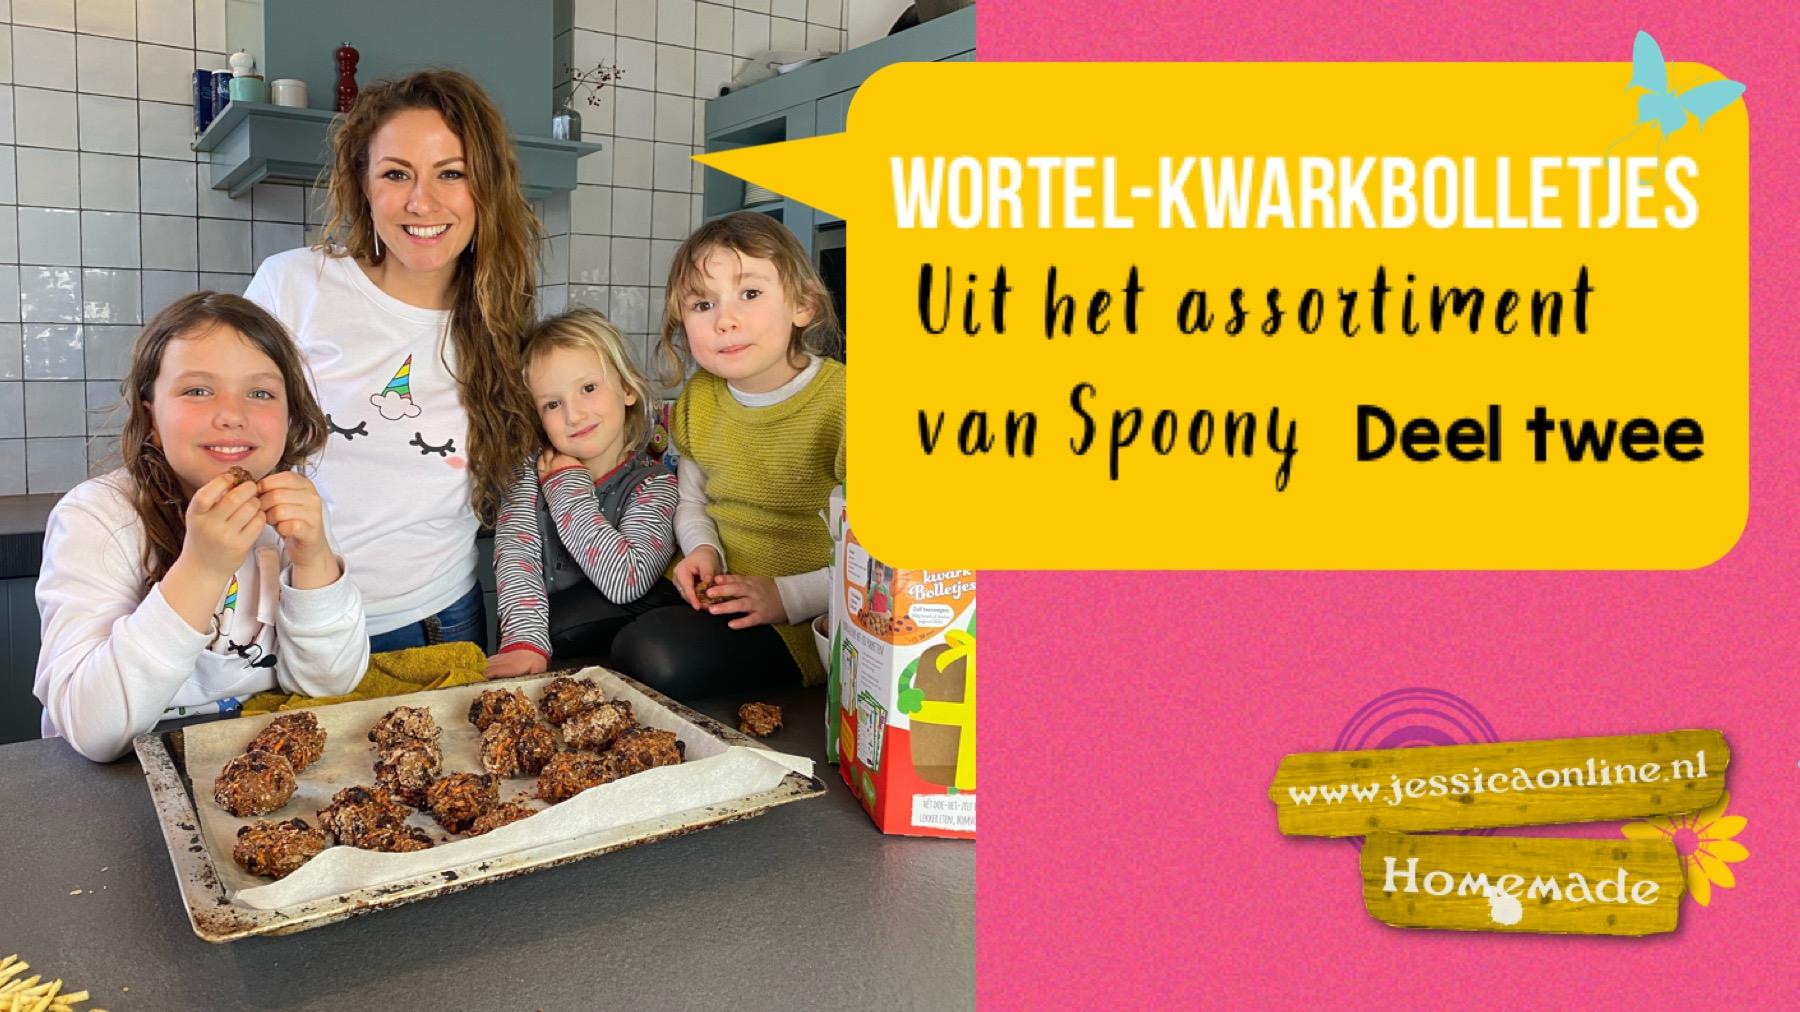 Spoony JessicaOnline.nl